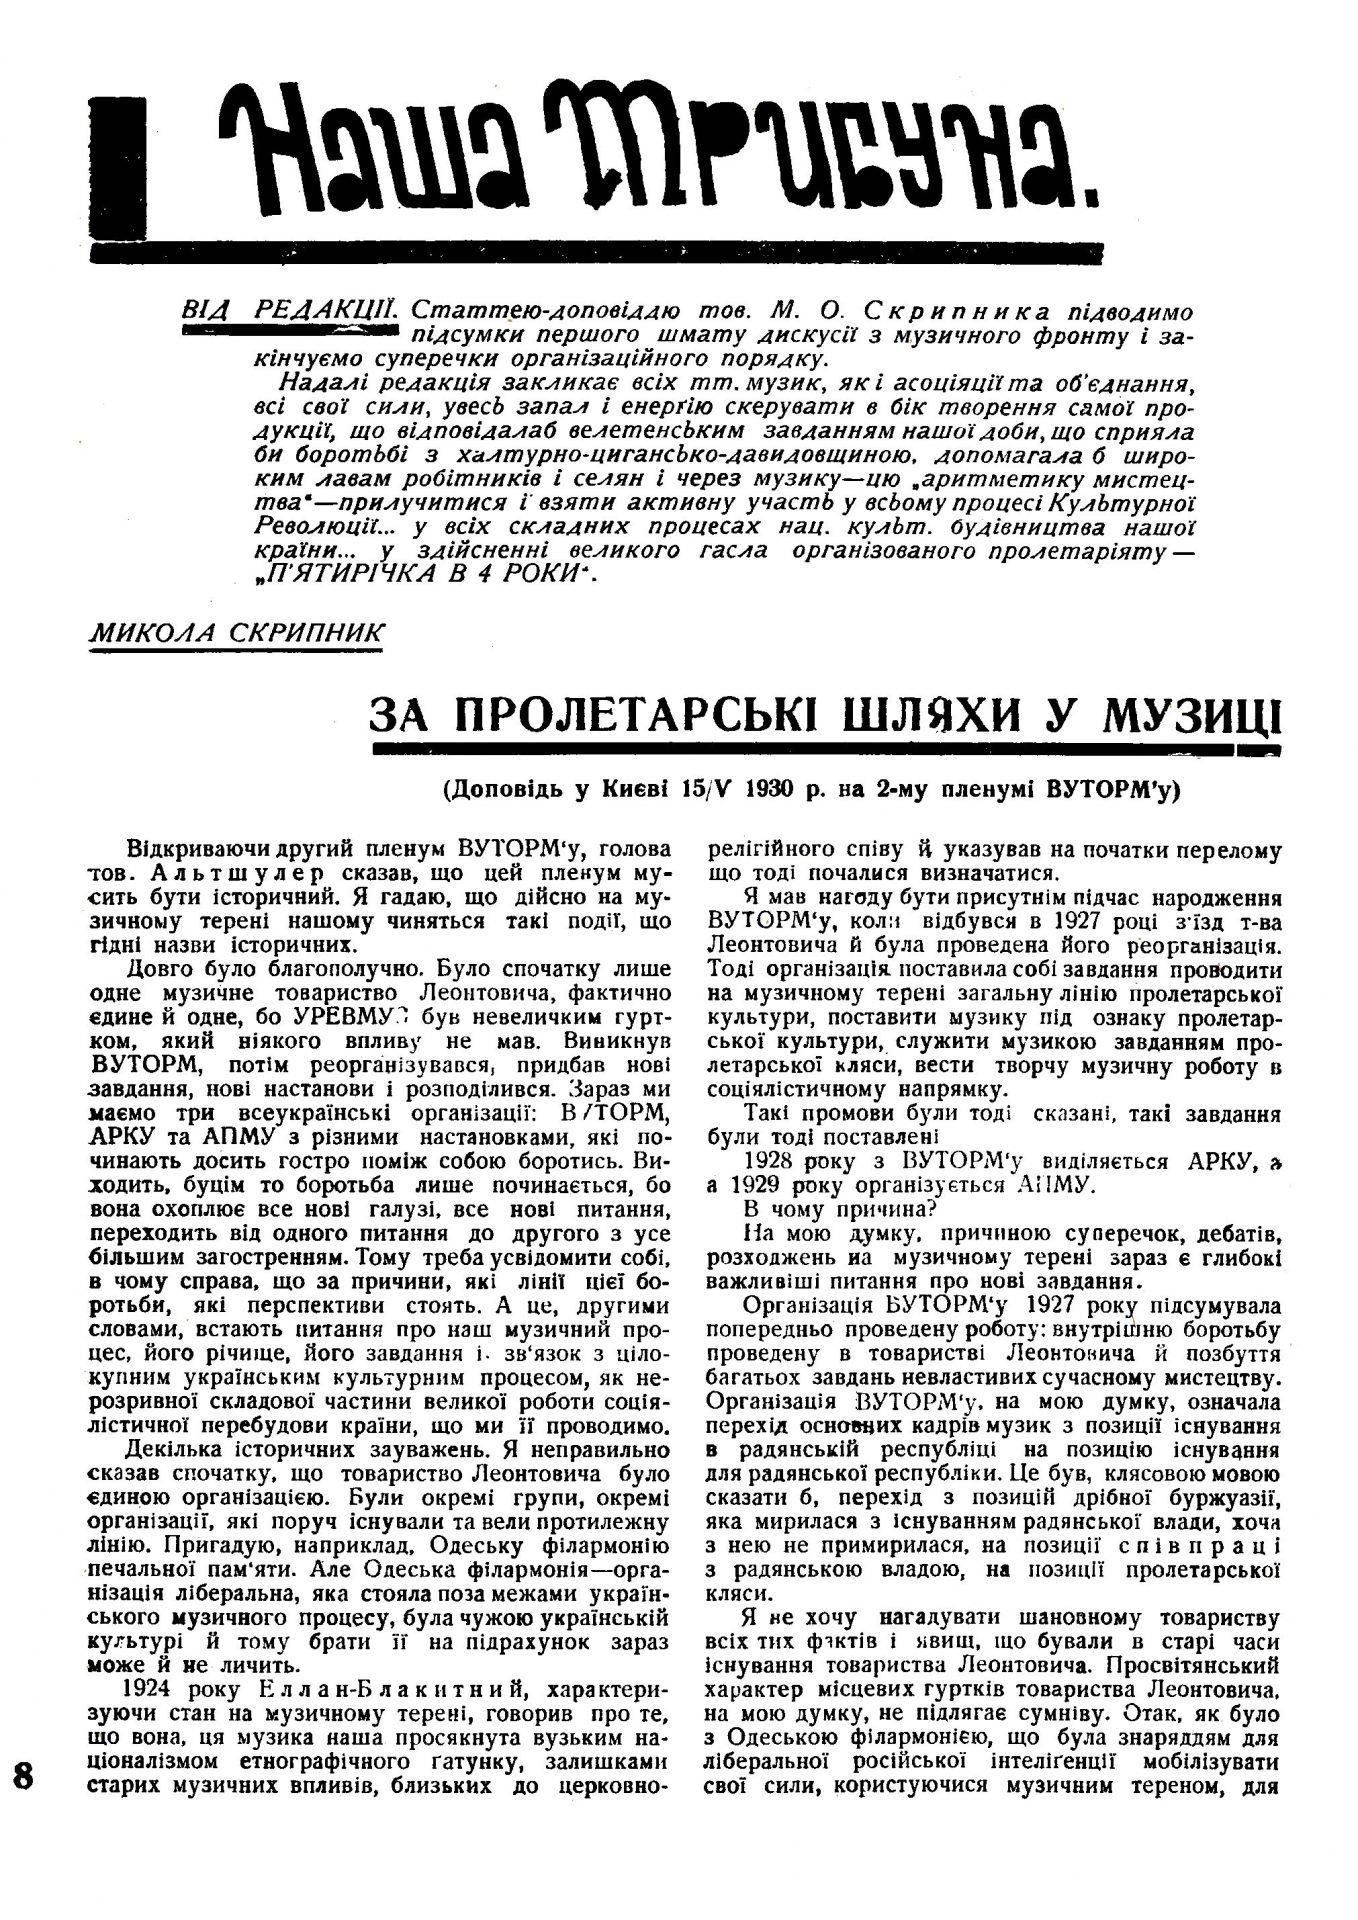 Мистецька трибуна_1930_№ 14